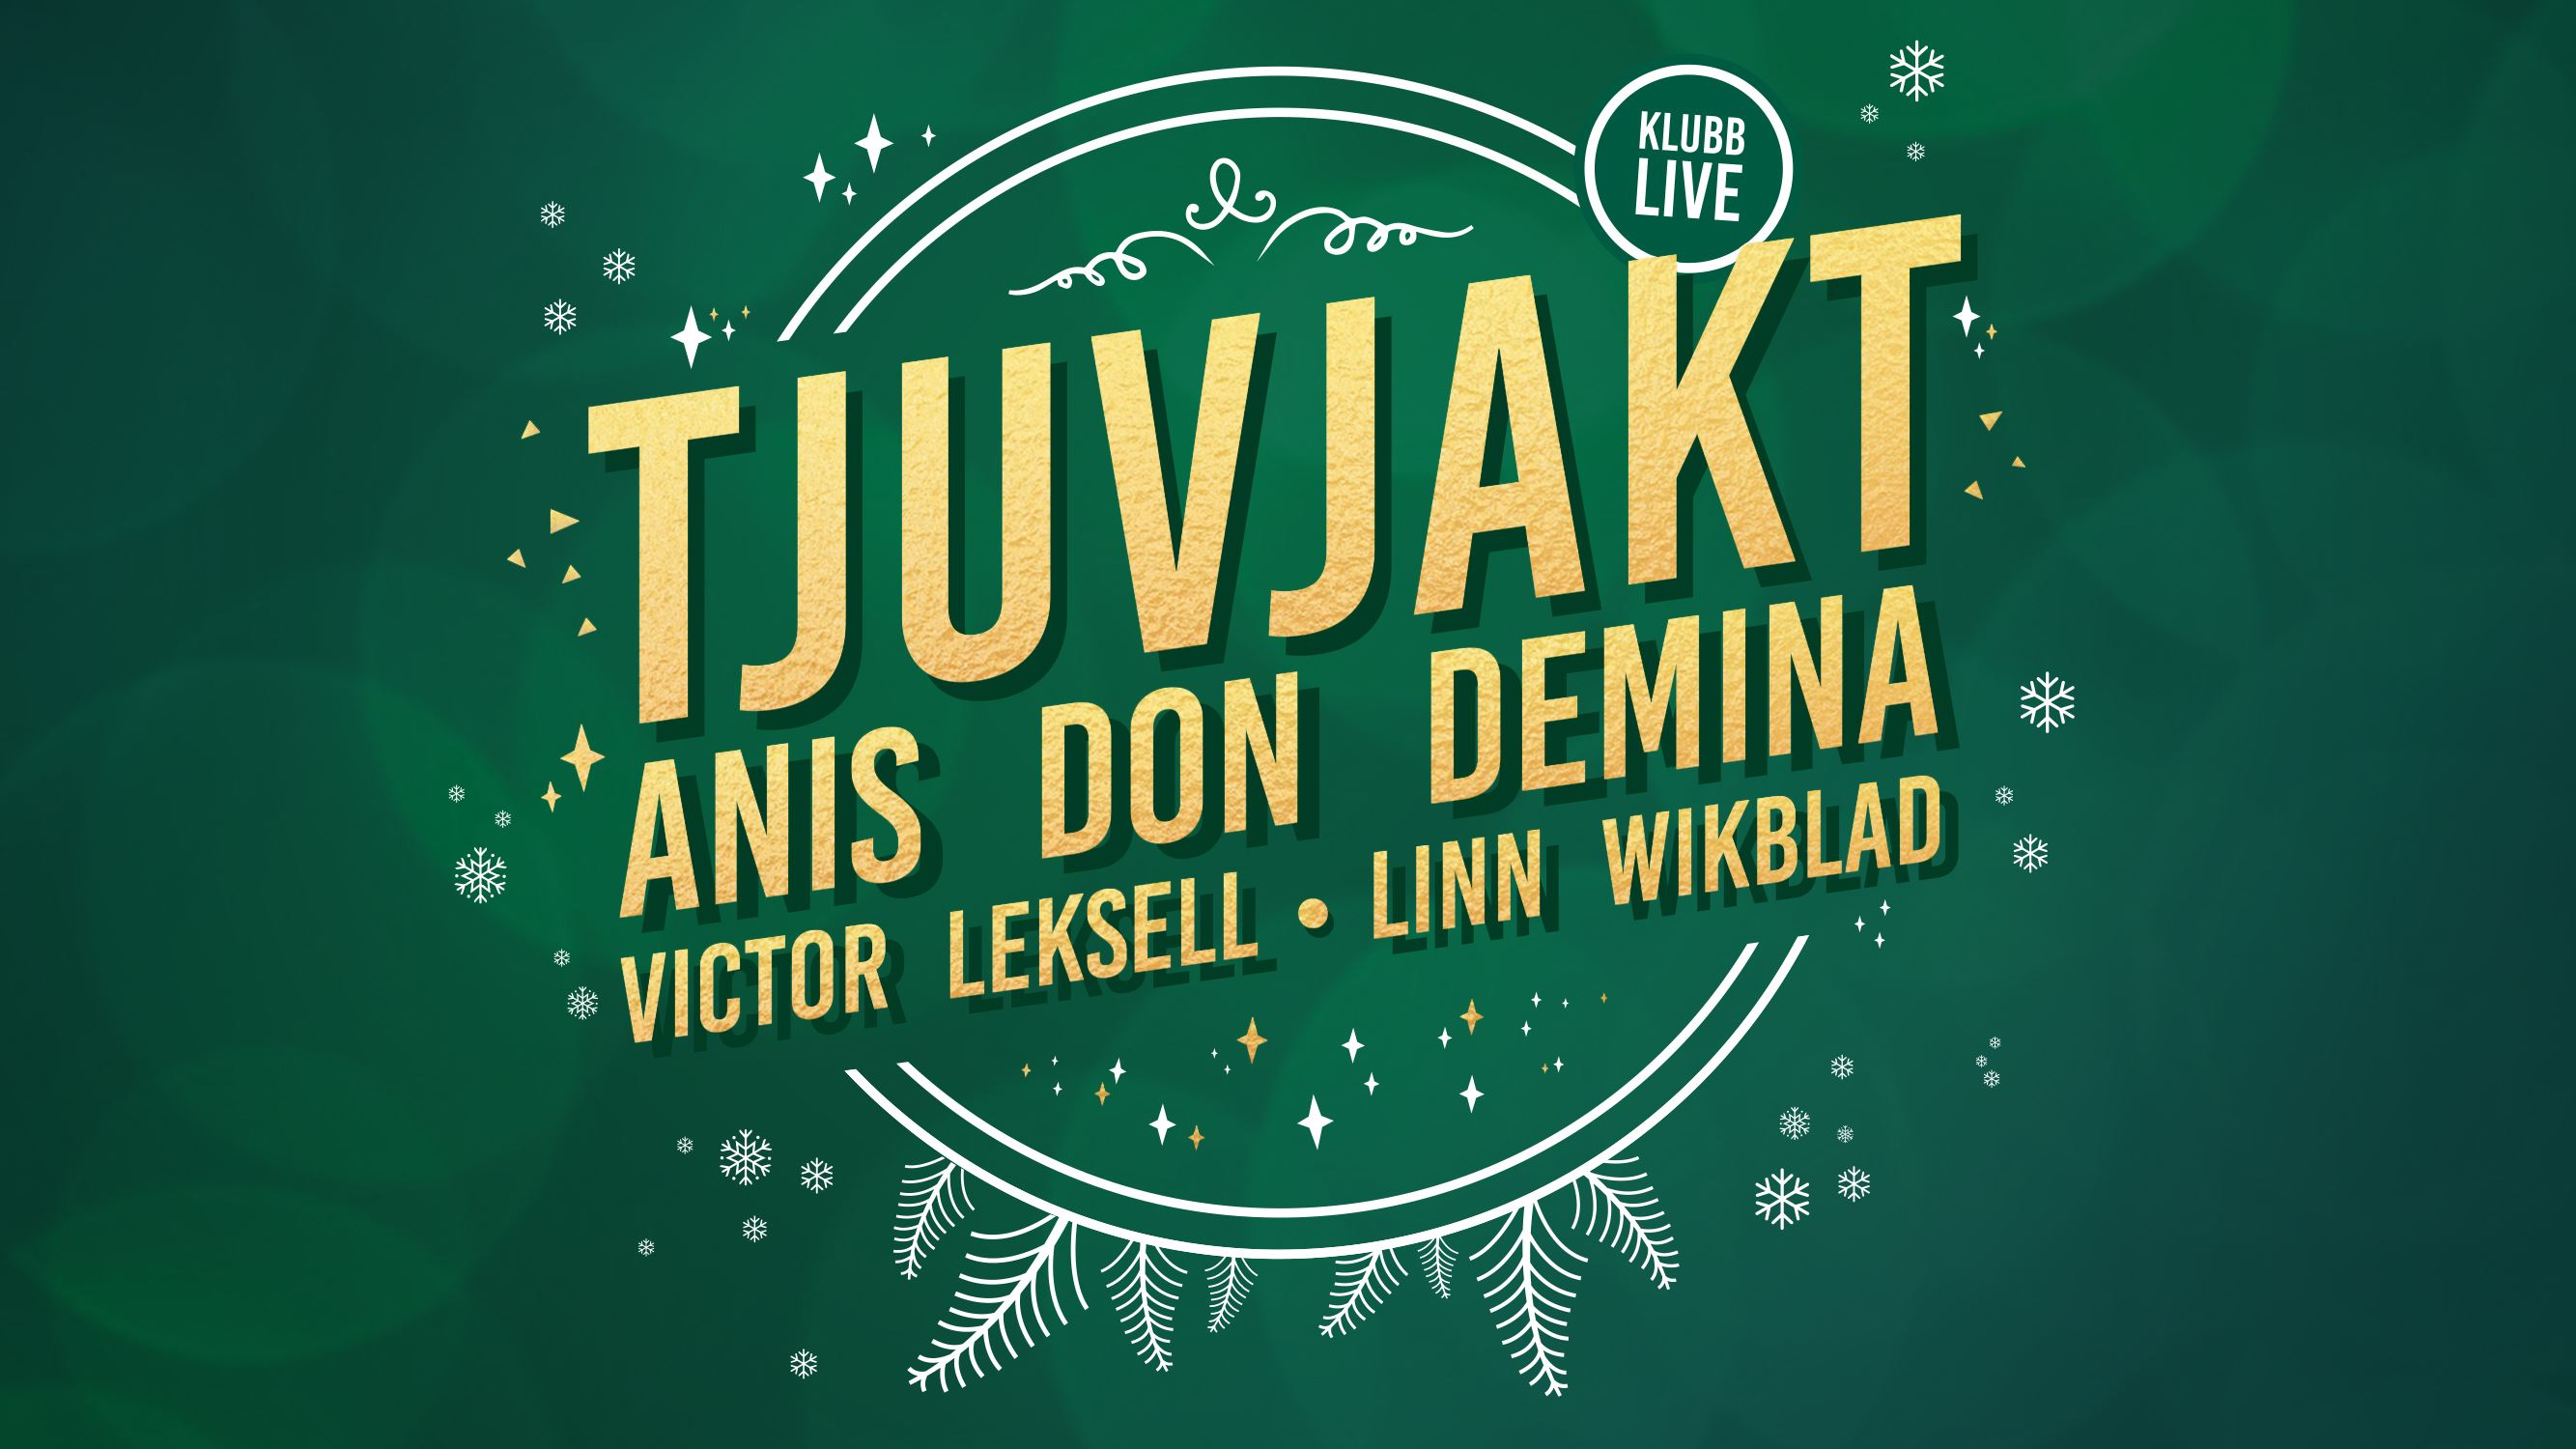 Klubb Live presenterar Tjuvjakt - Anis Don Demina - Victor Leksell - Linn Wikblad